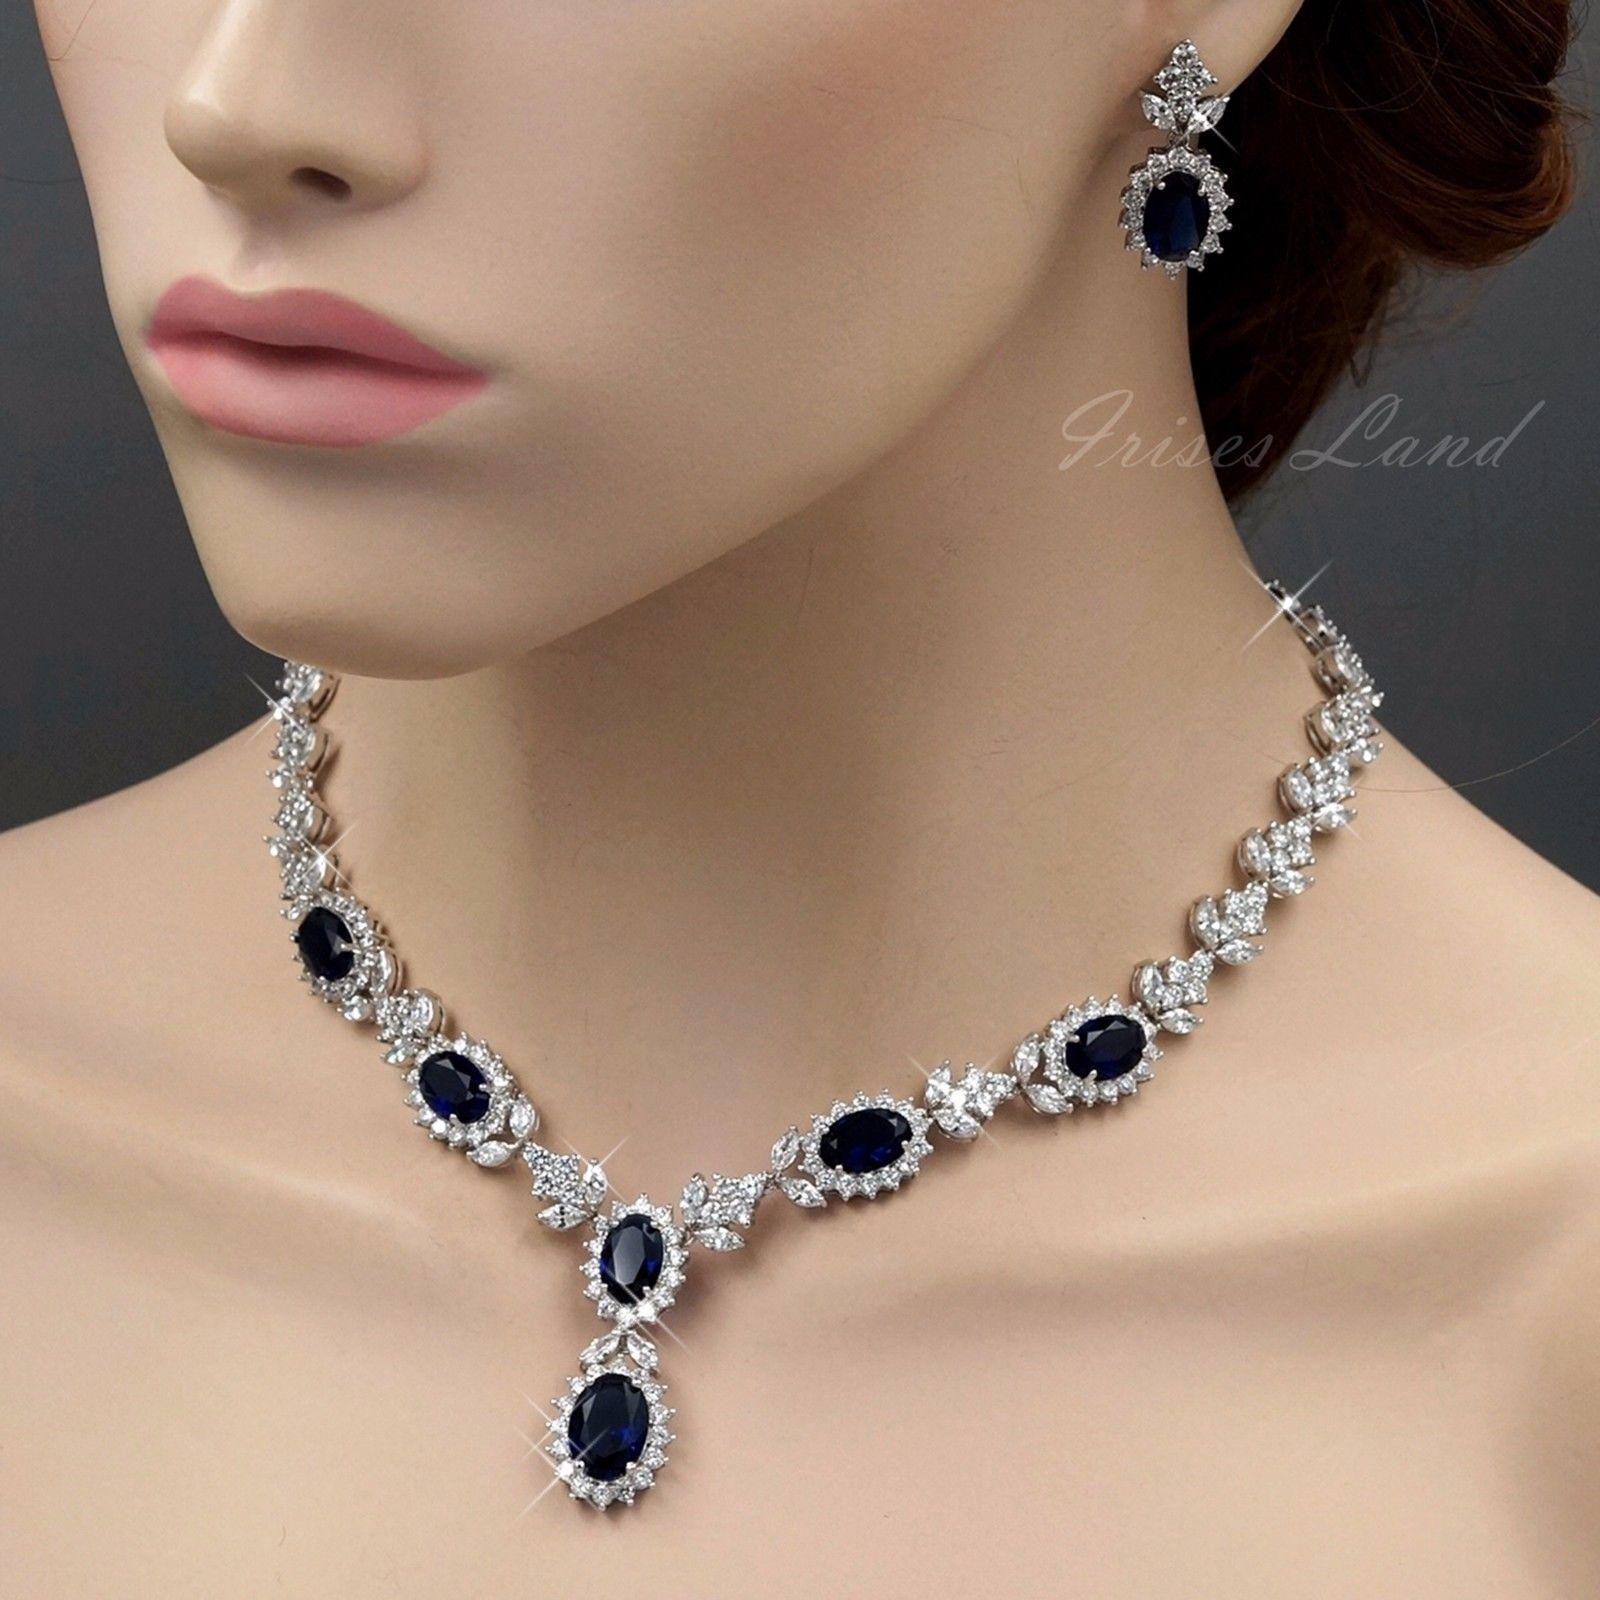 K white gold gp sapphire zirconia cz necklace earrings wedding